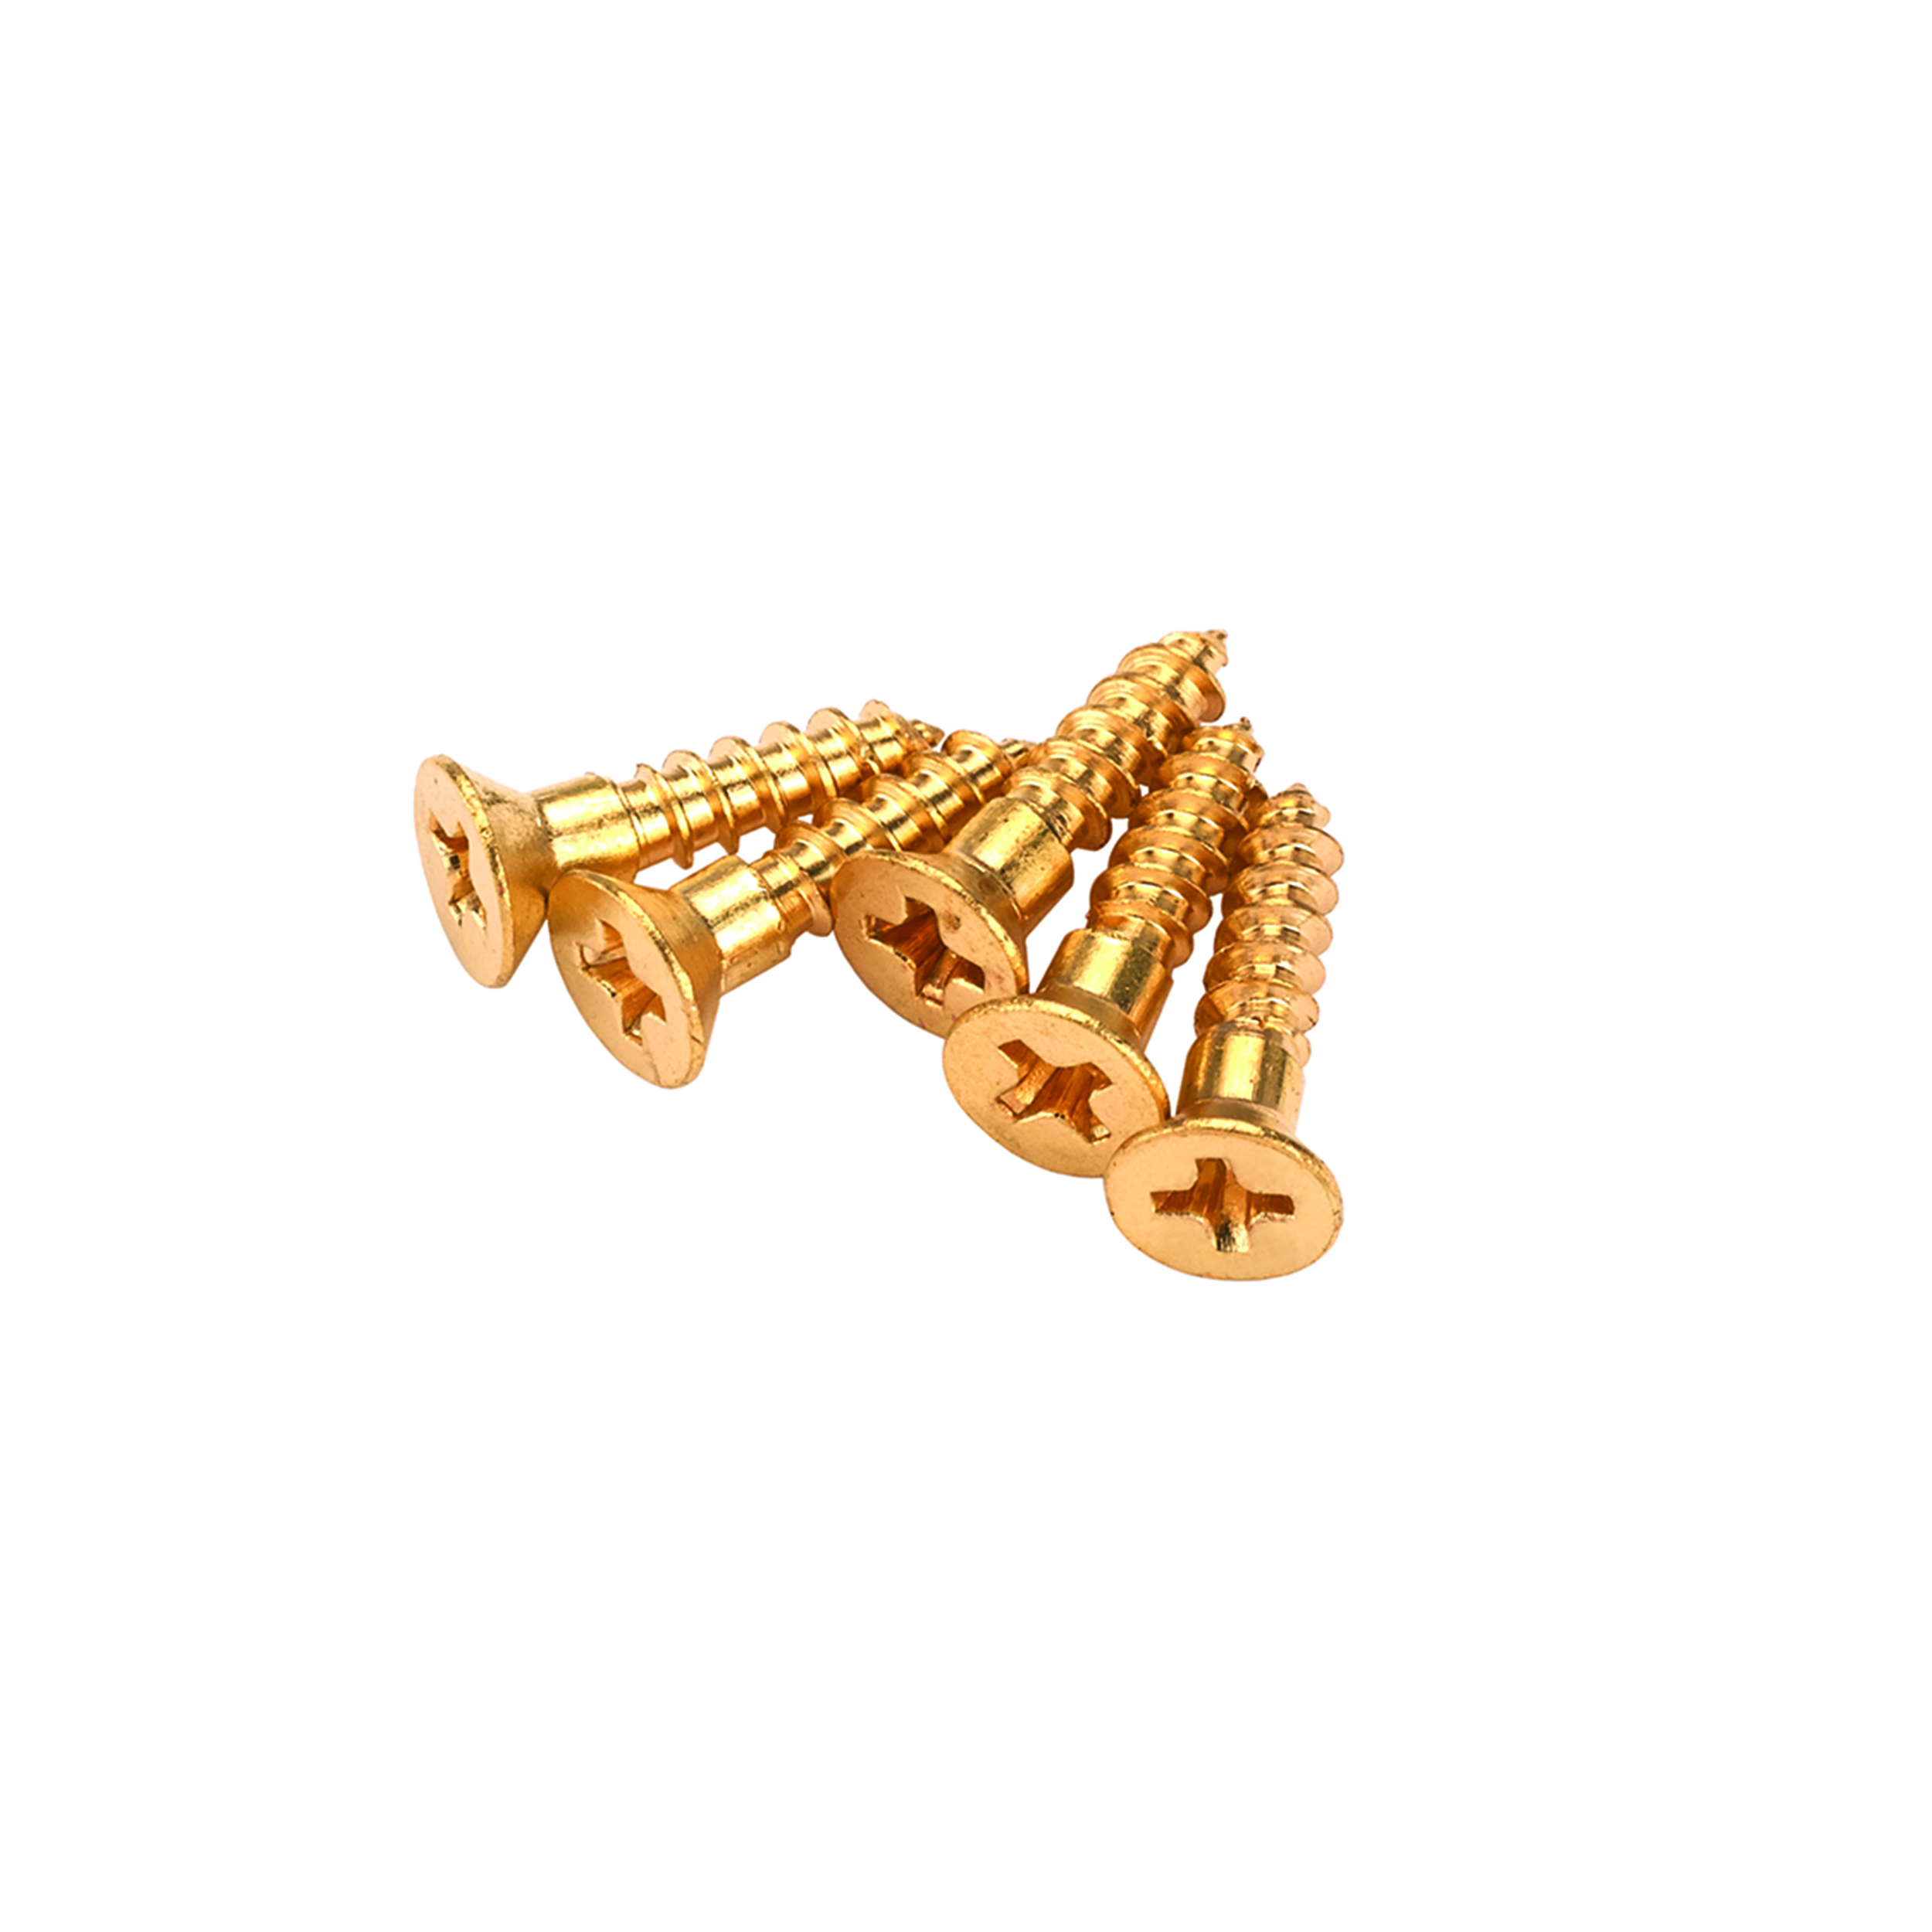 Solid Brass Screws #2 x 1/2